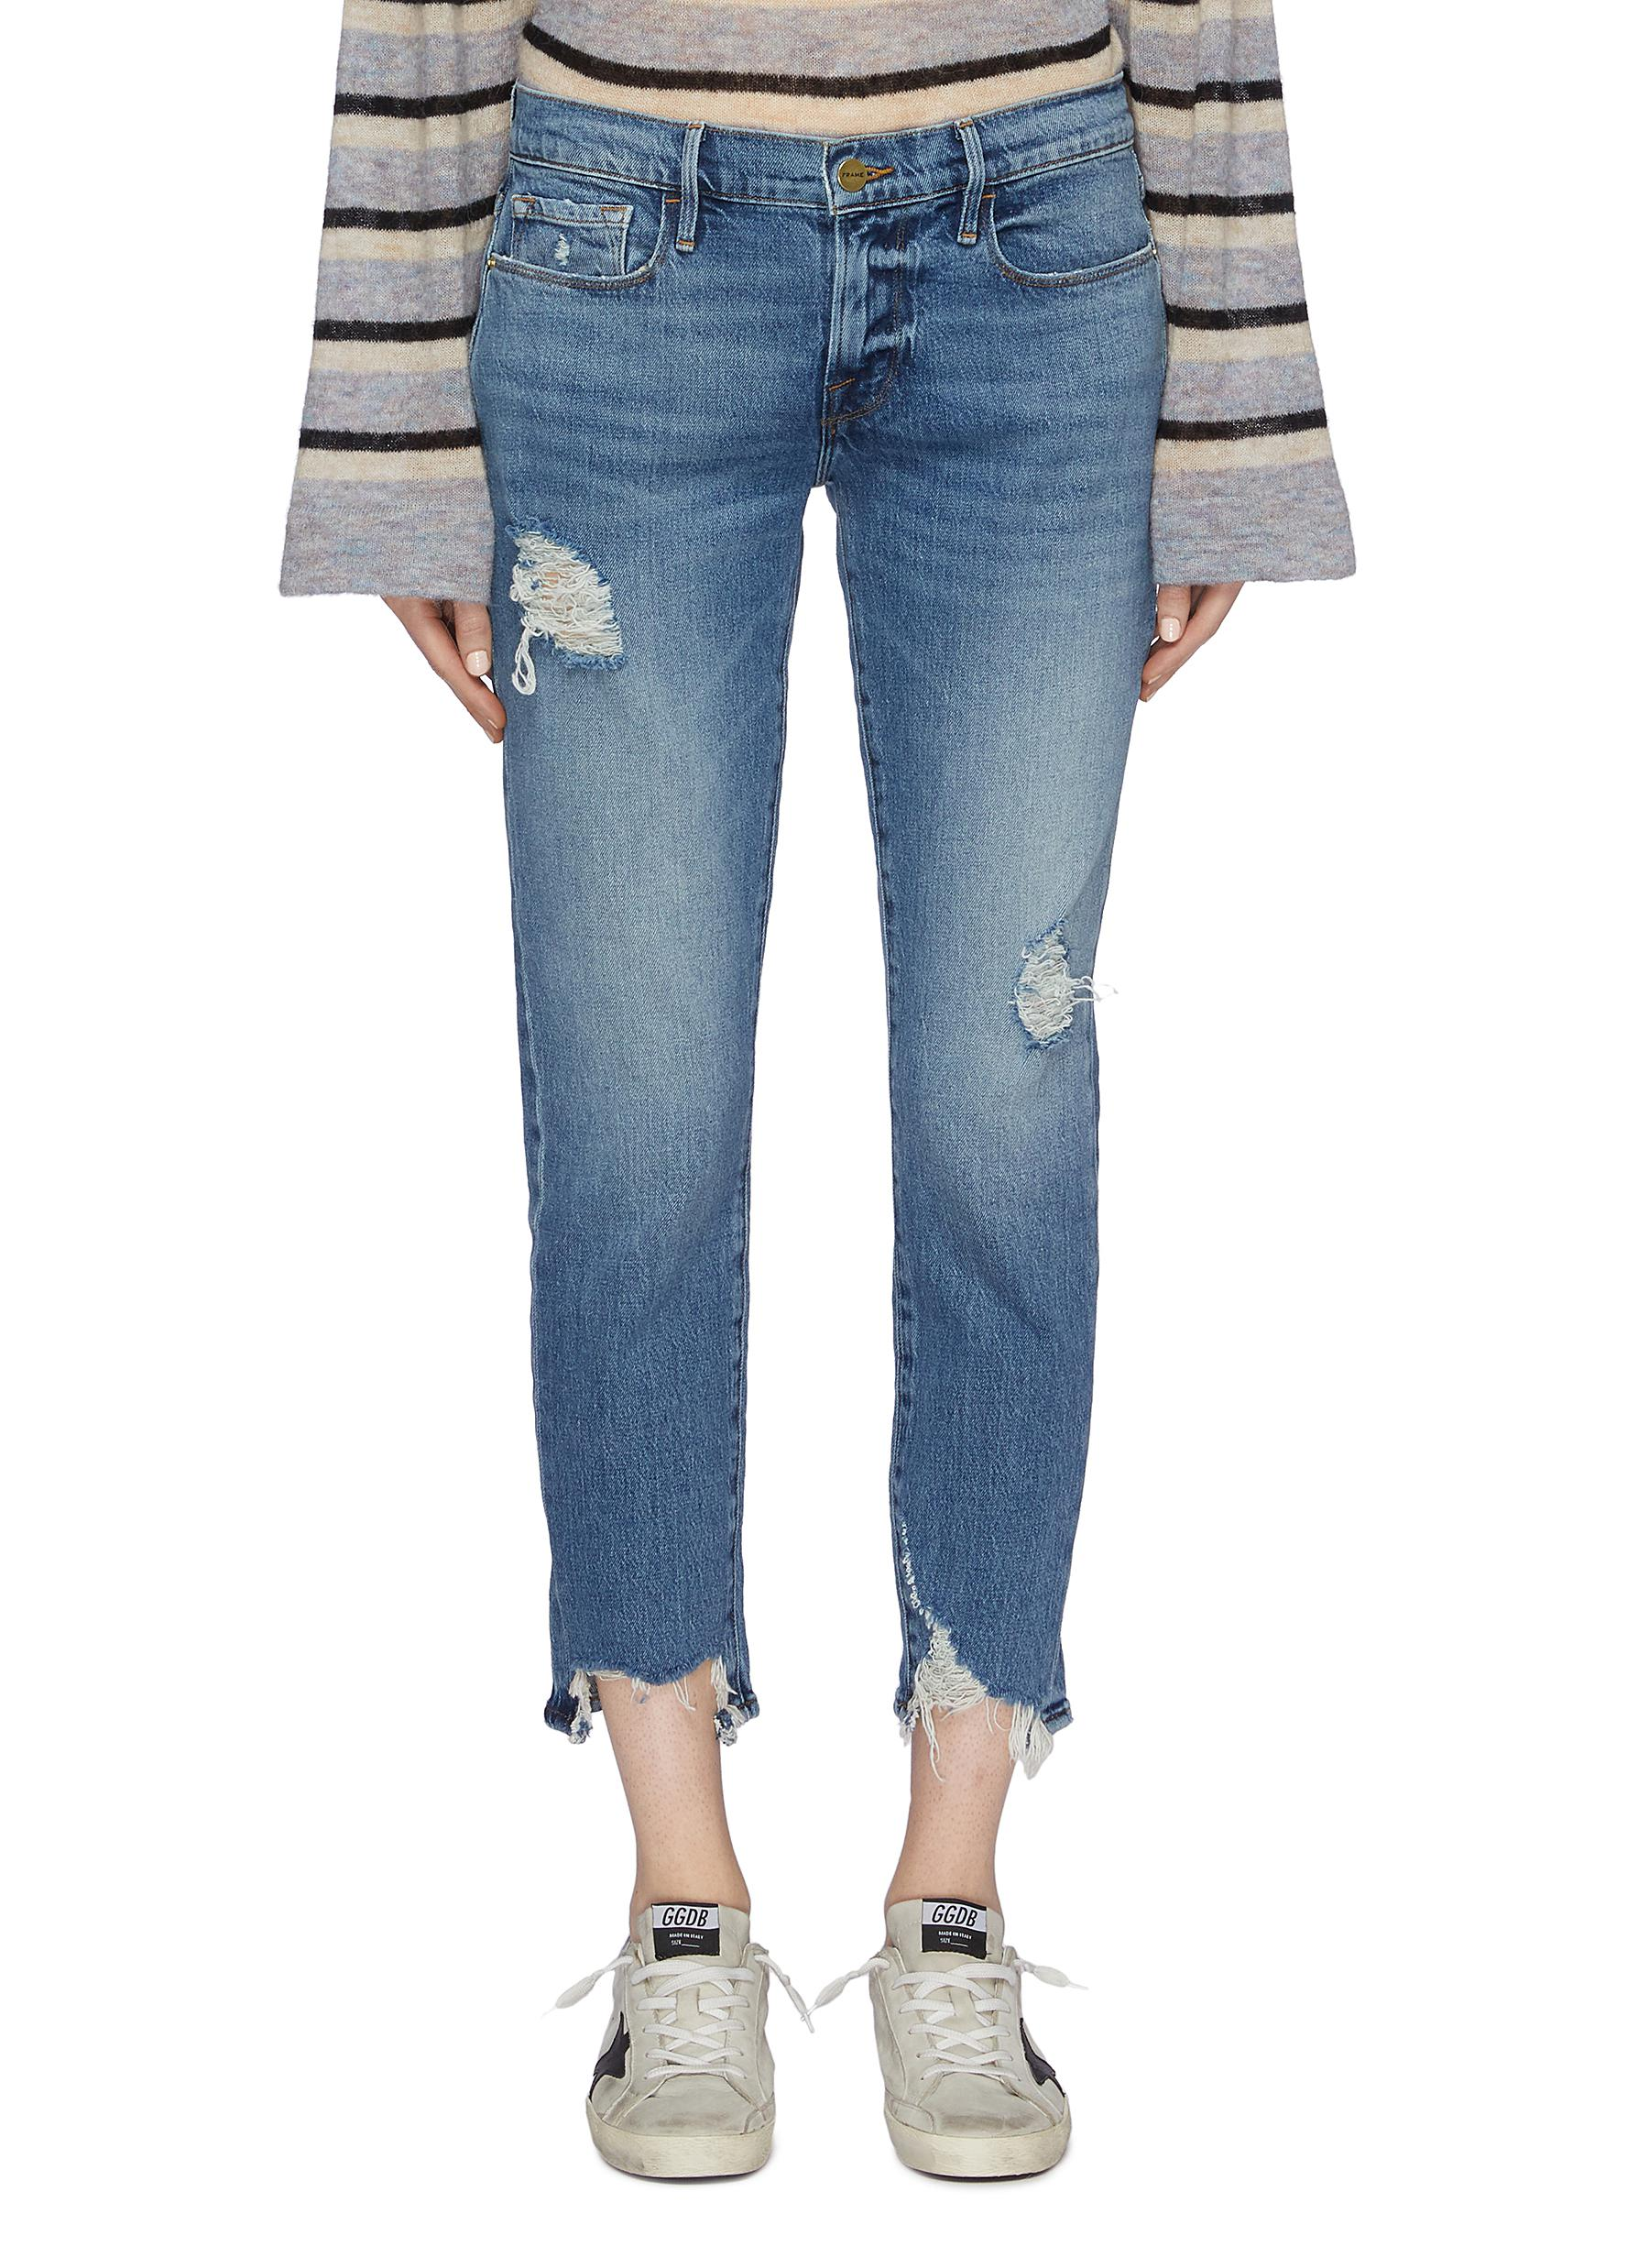 Le Garcon Crop boyfriend jeans by Frame Denim